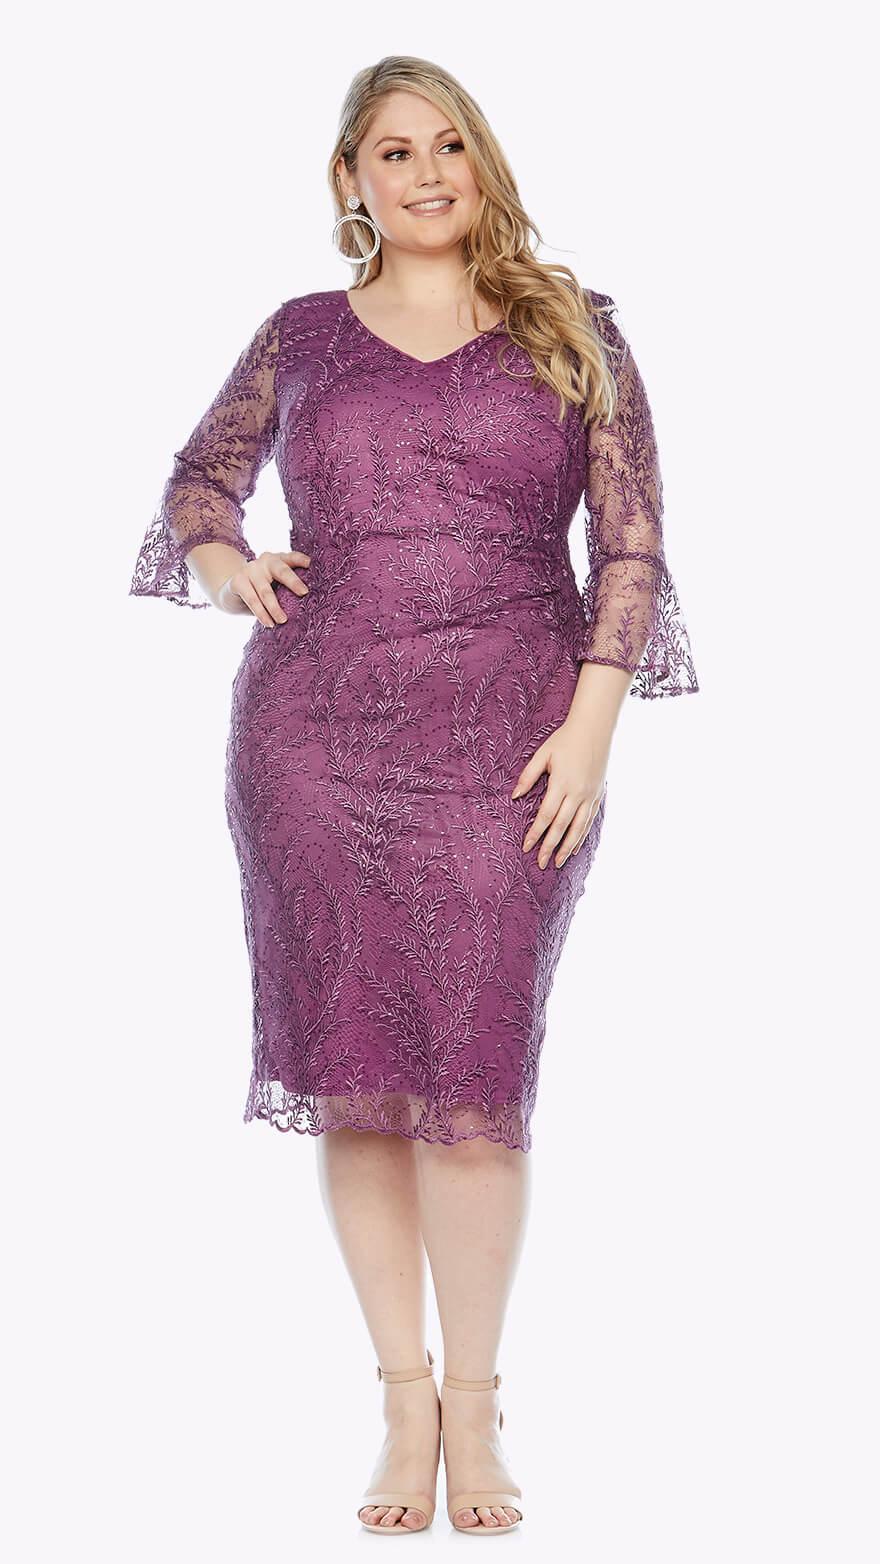 LJ0351 Knee-length dress with beautiful bell sleeves